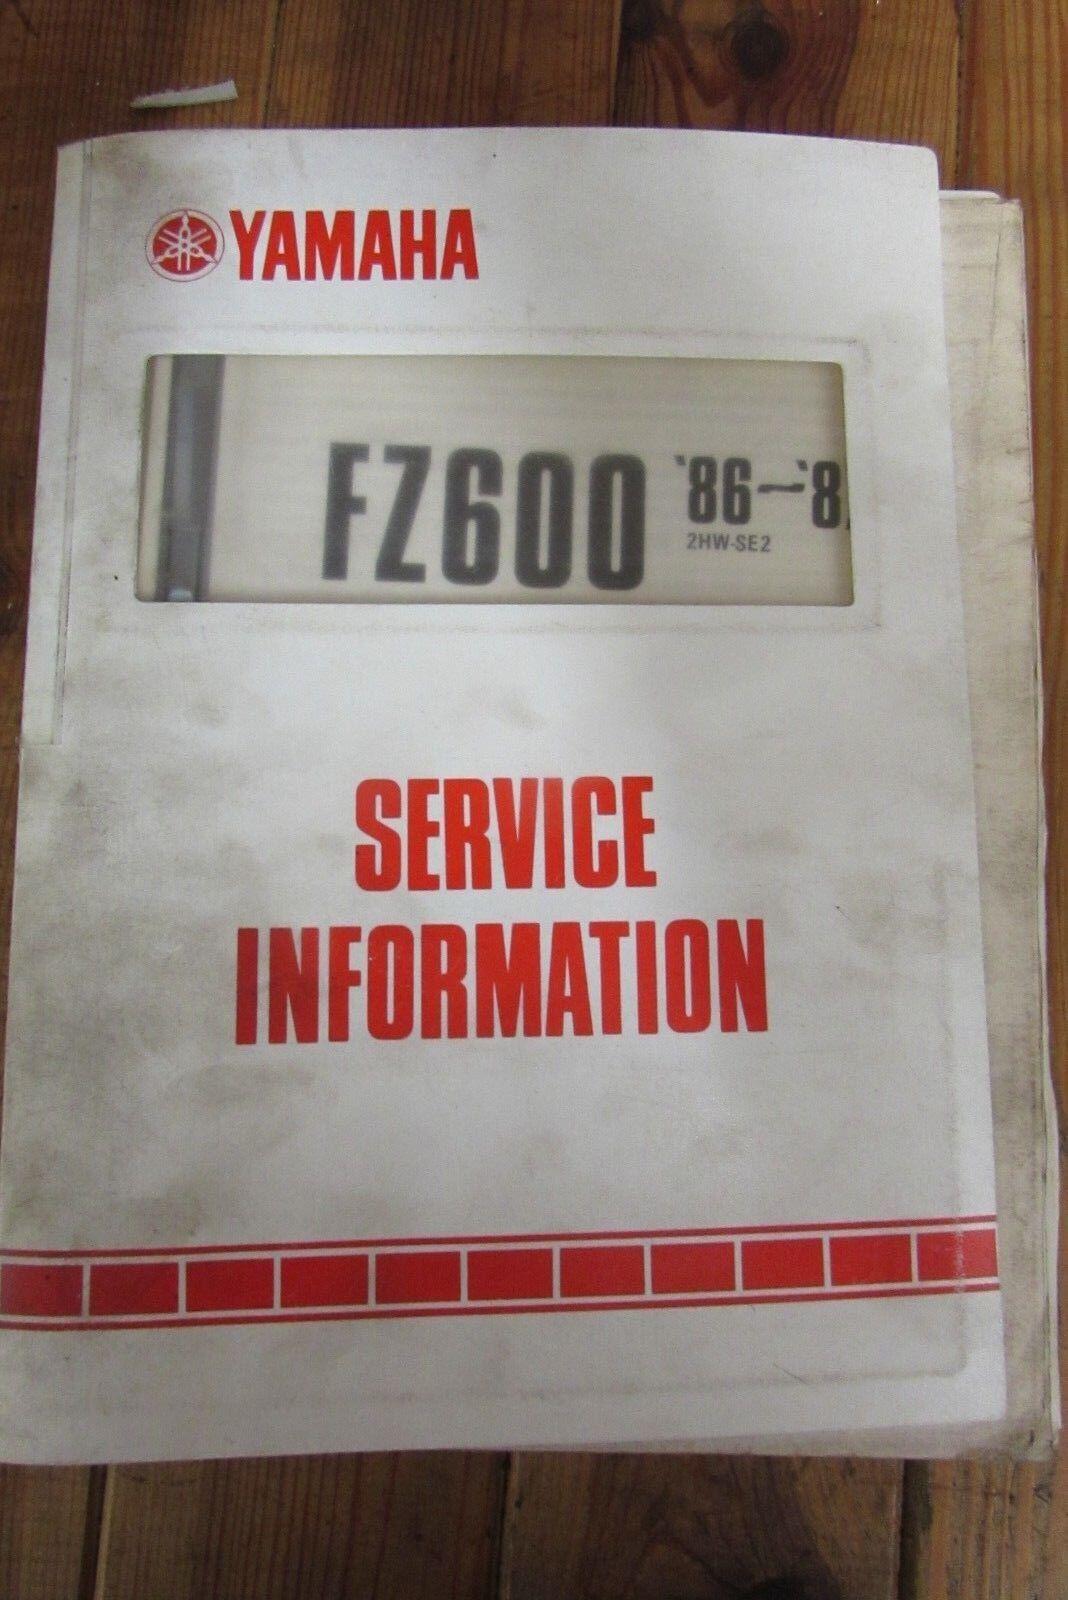 1986 1987 YAMAHA FZ600 SERVICE INFORMATION + WIRING DIAGRAM 2HW-SE2 Xt Wiring Diagram on